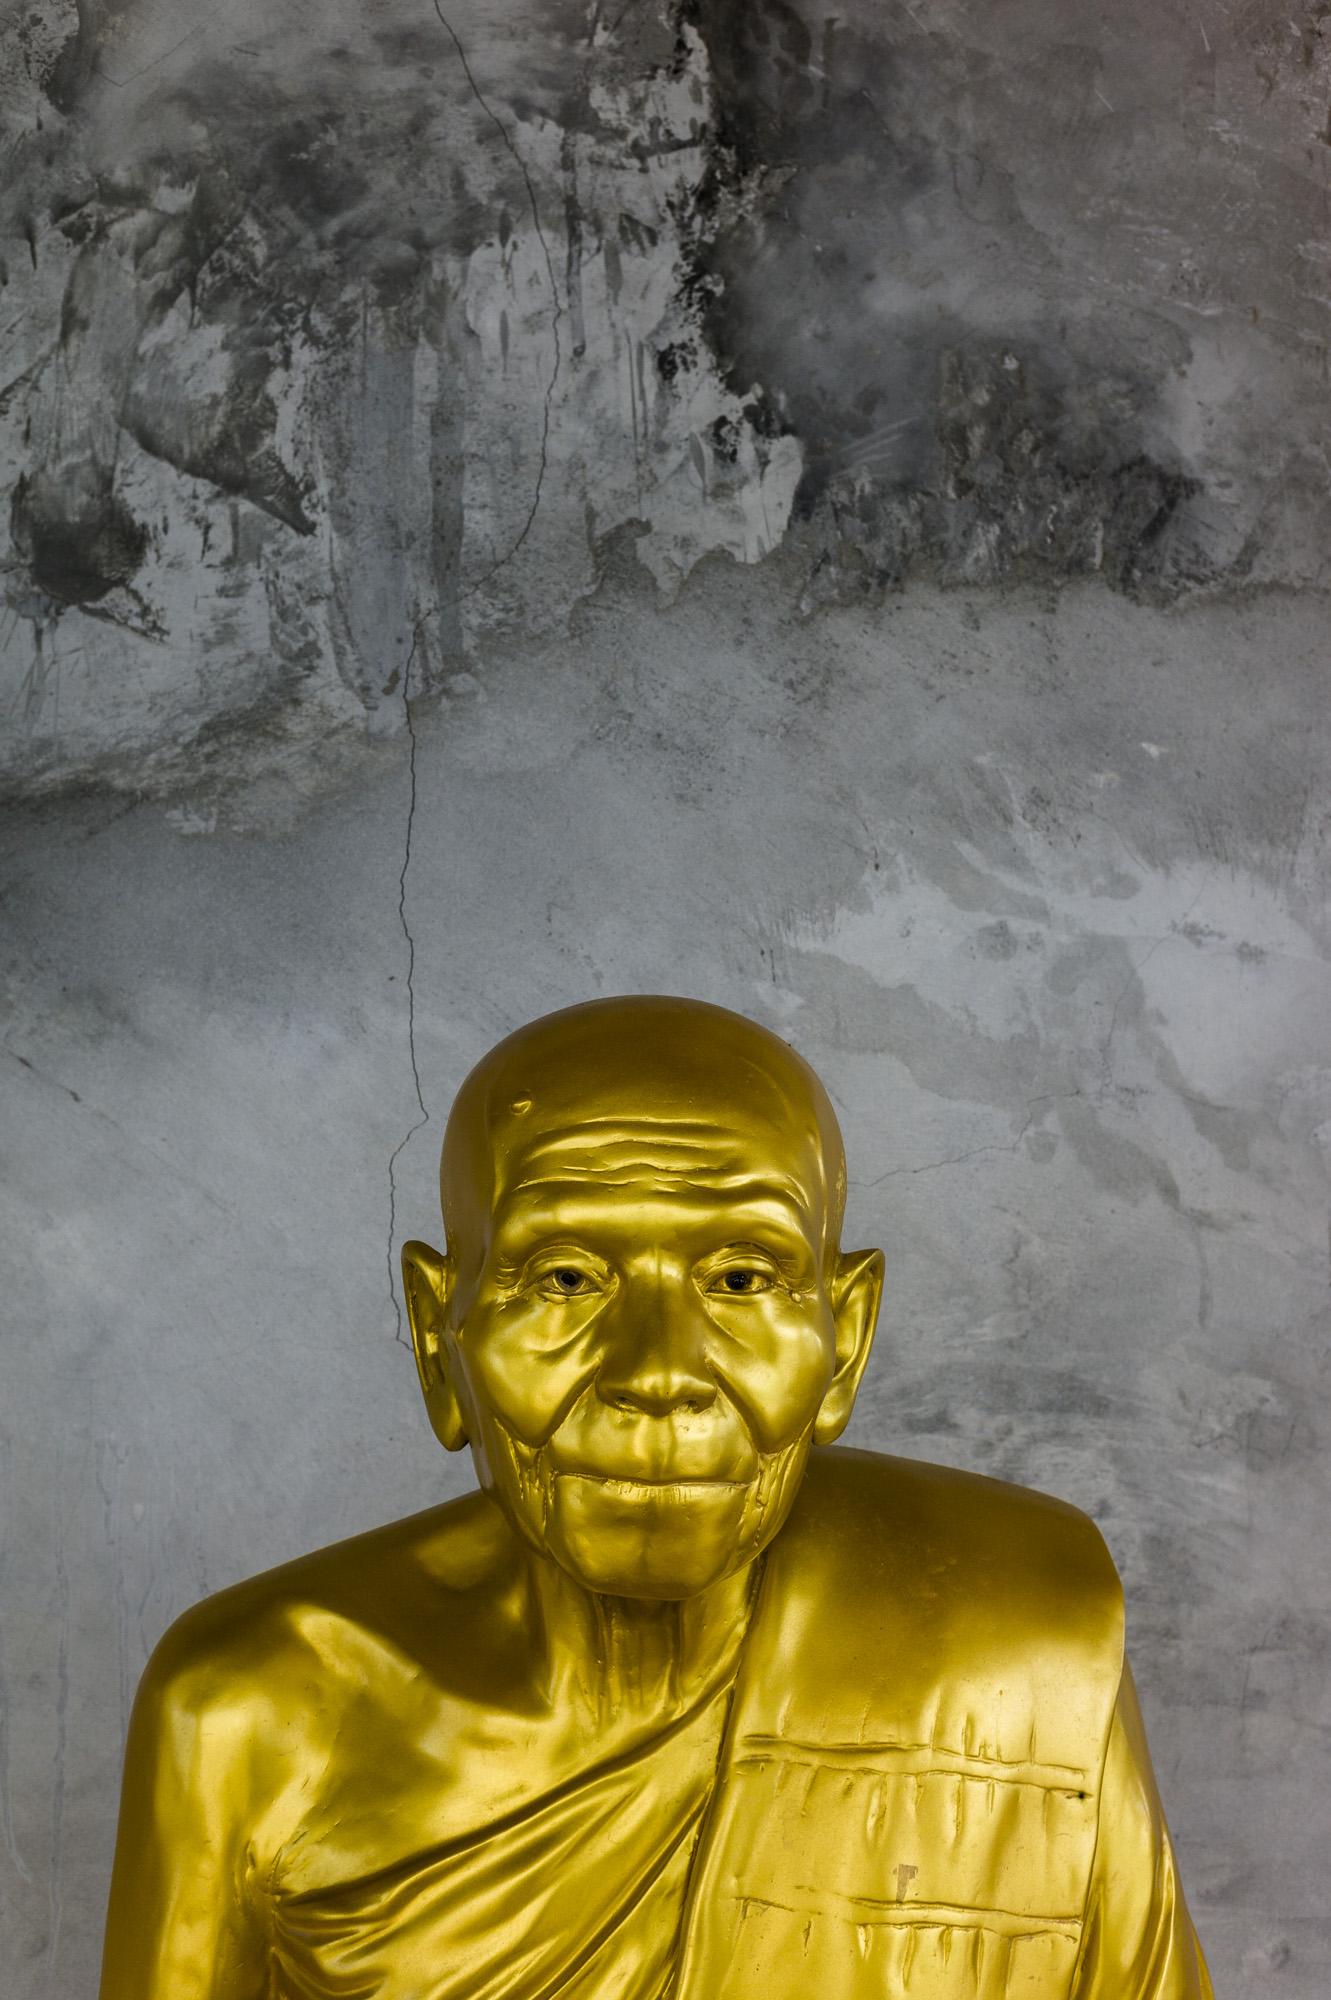 Big_Buddha_Temple_Portrait_1_Phuket_Thailand copy 2.jpg